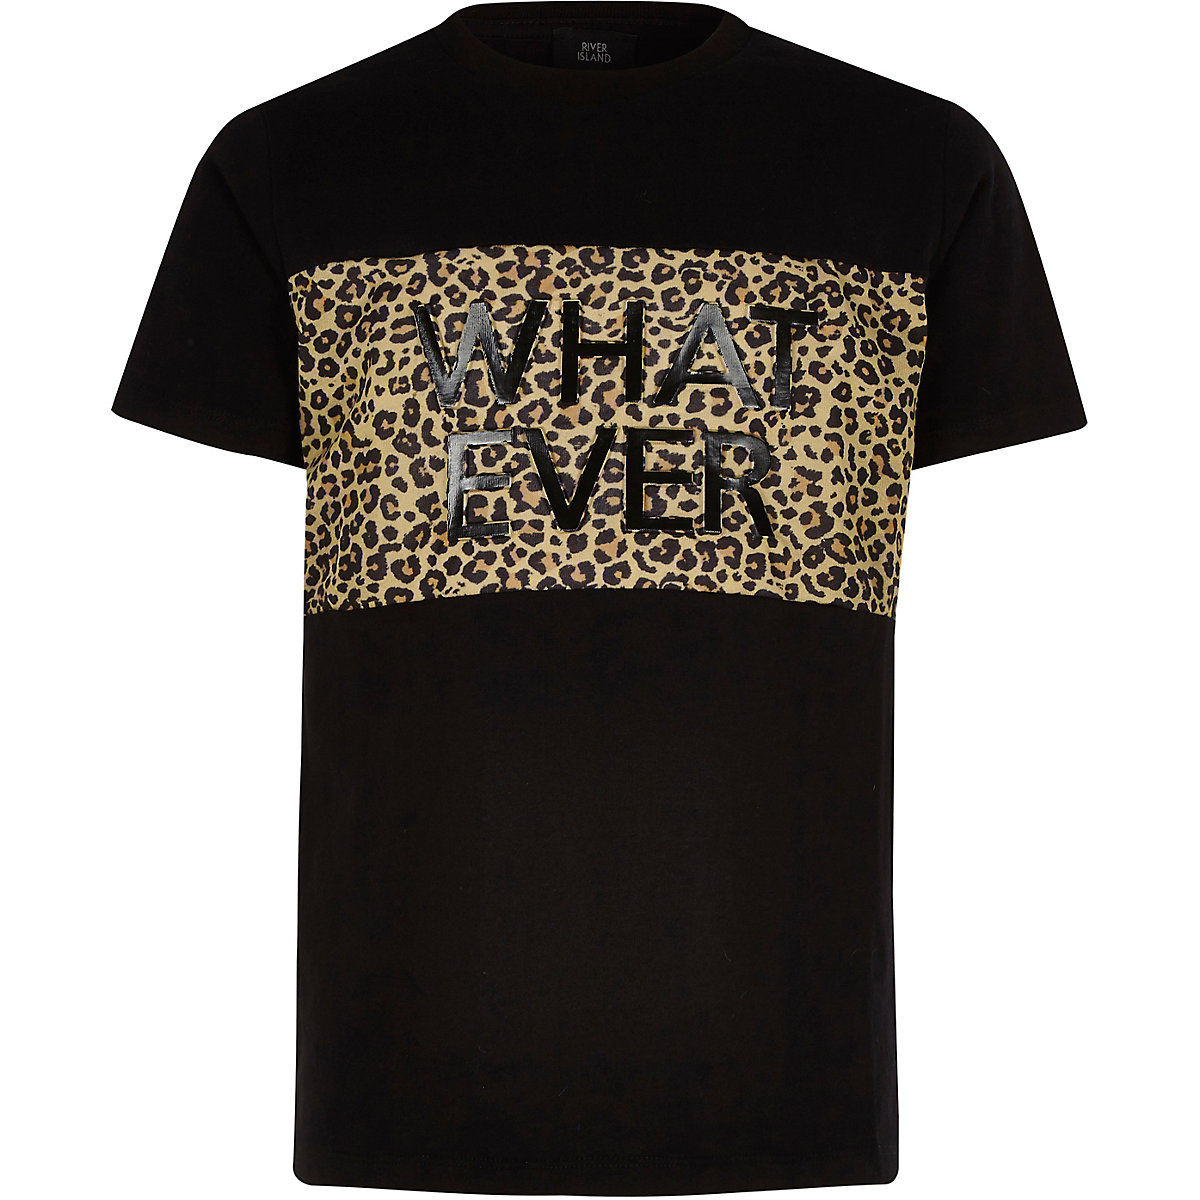 Boys black leopard 'whatever' printed T-shirt